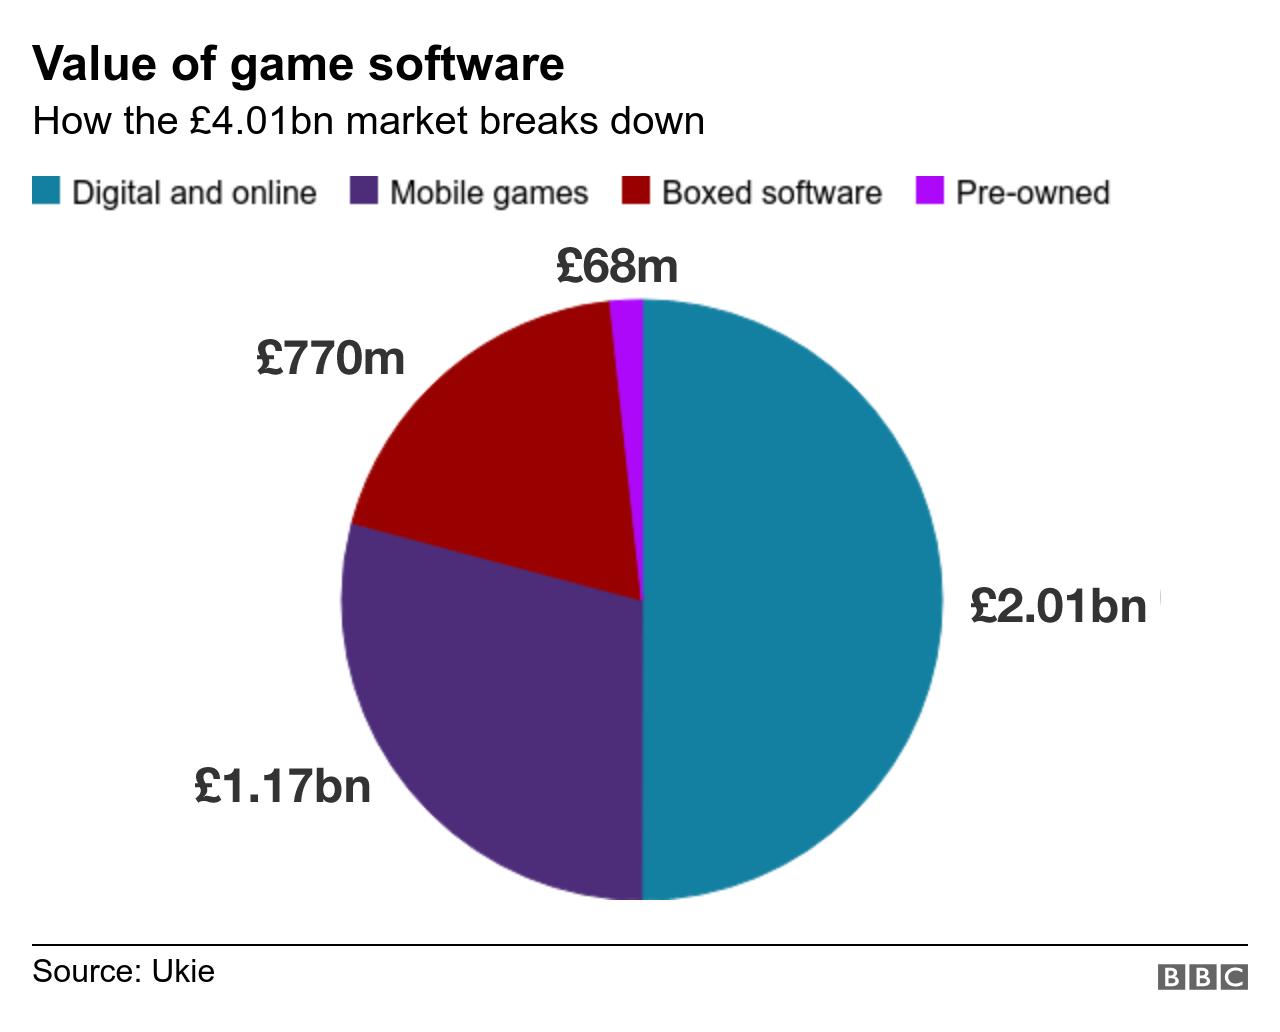 Graphic: Breakdown of software market value